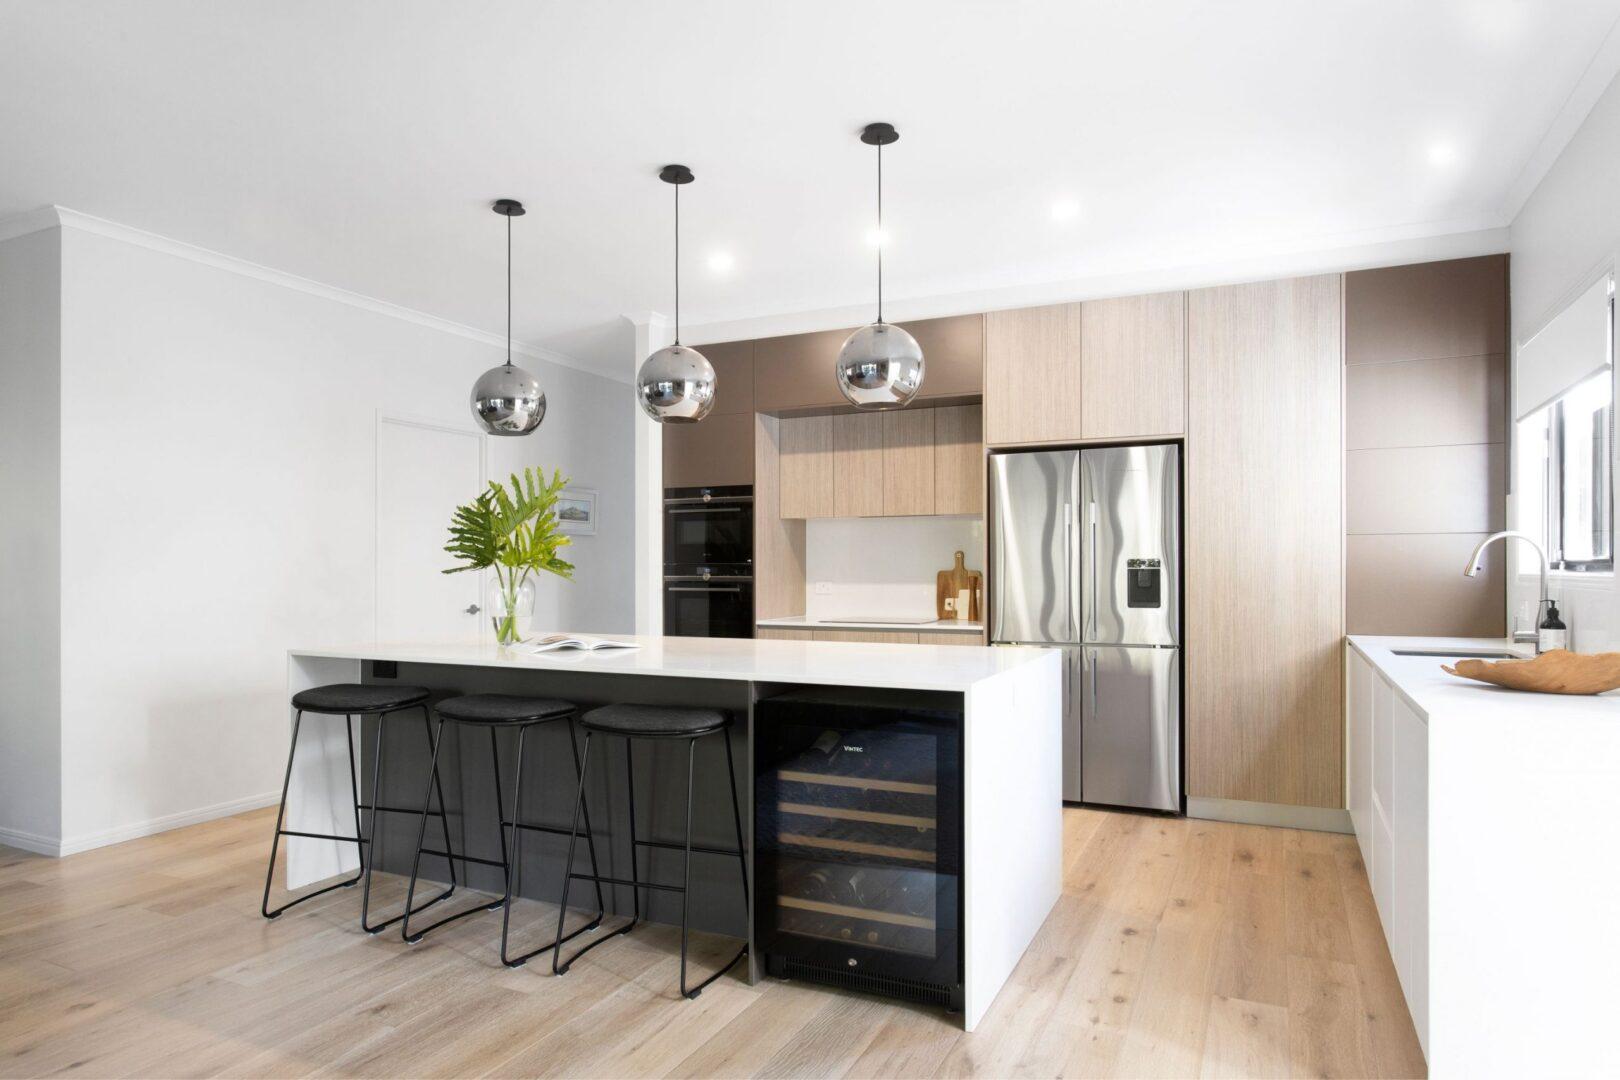 Brisbane Kitchen and Bathroom Renovations